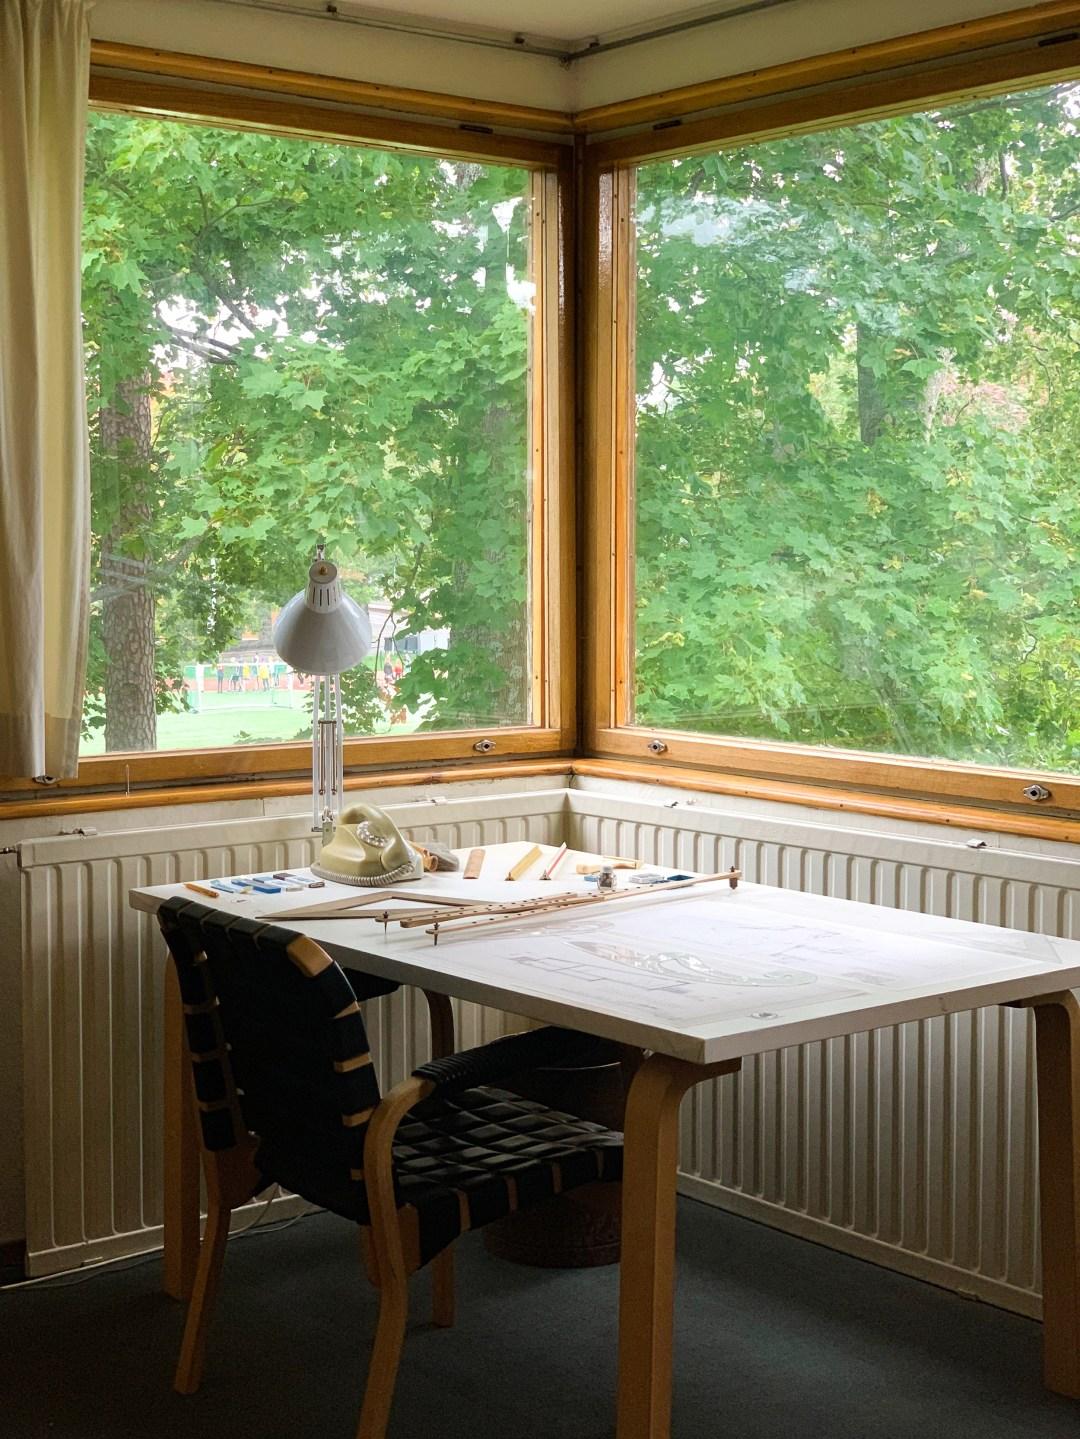 Alvar Aalto's home desk